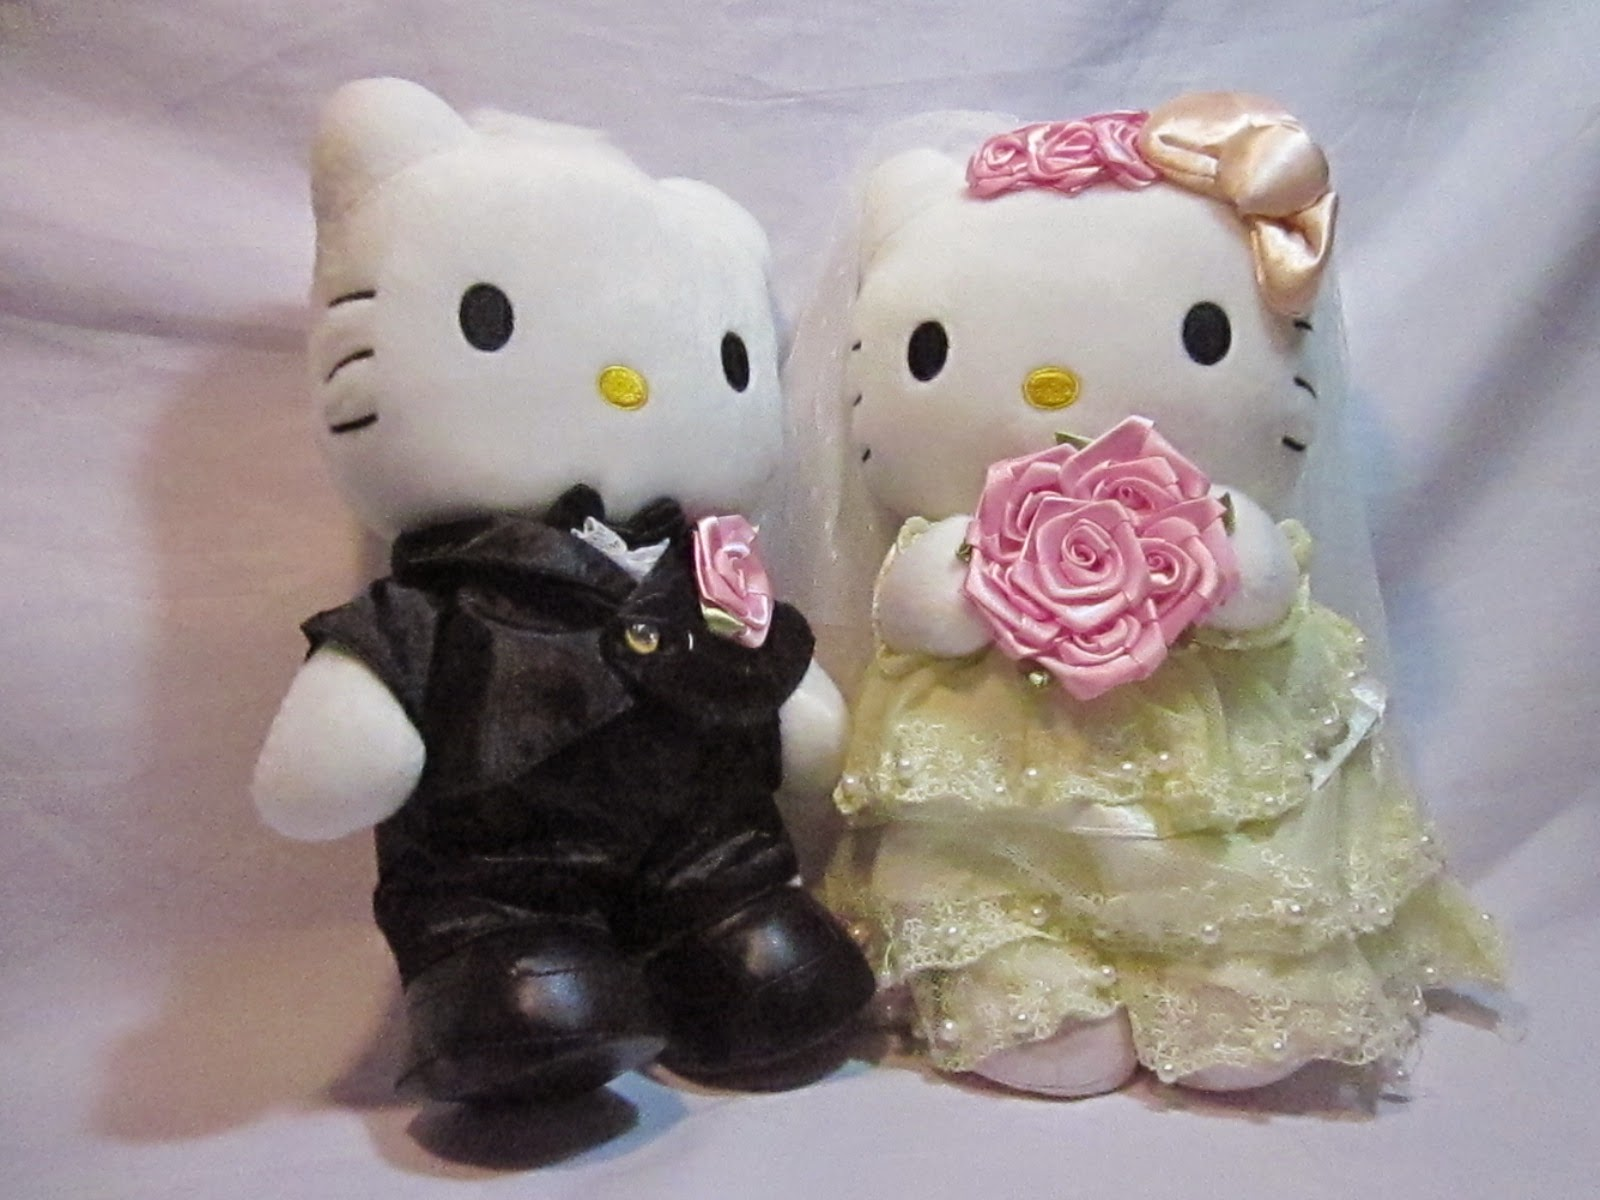 Gratis gambar boneka hello kitty berpasangan